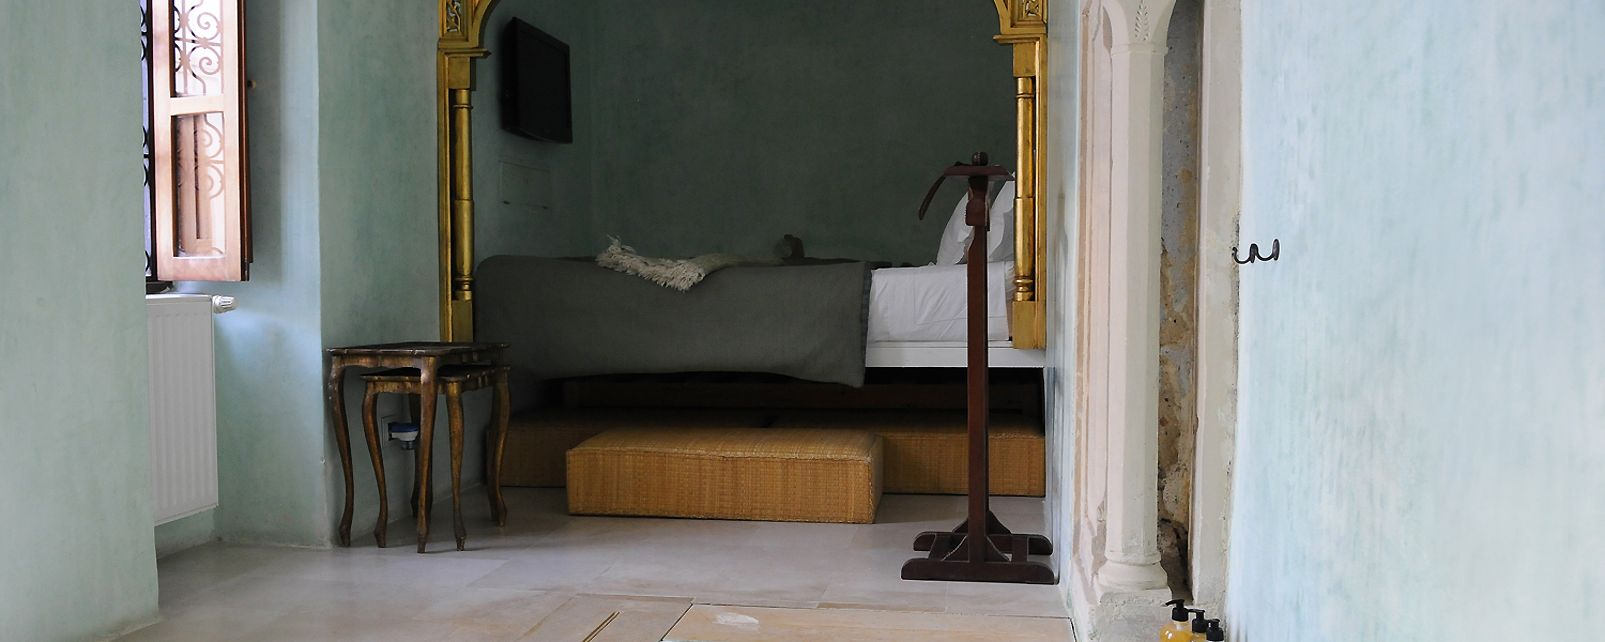 Hôtel Dar Sabri